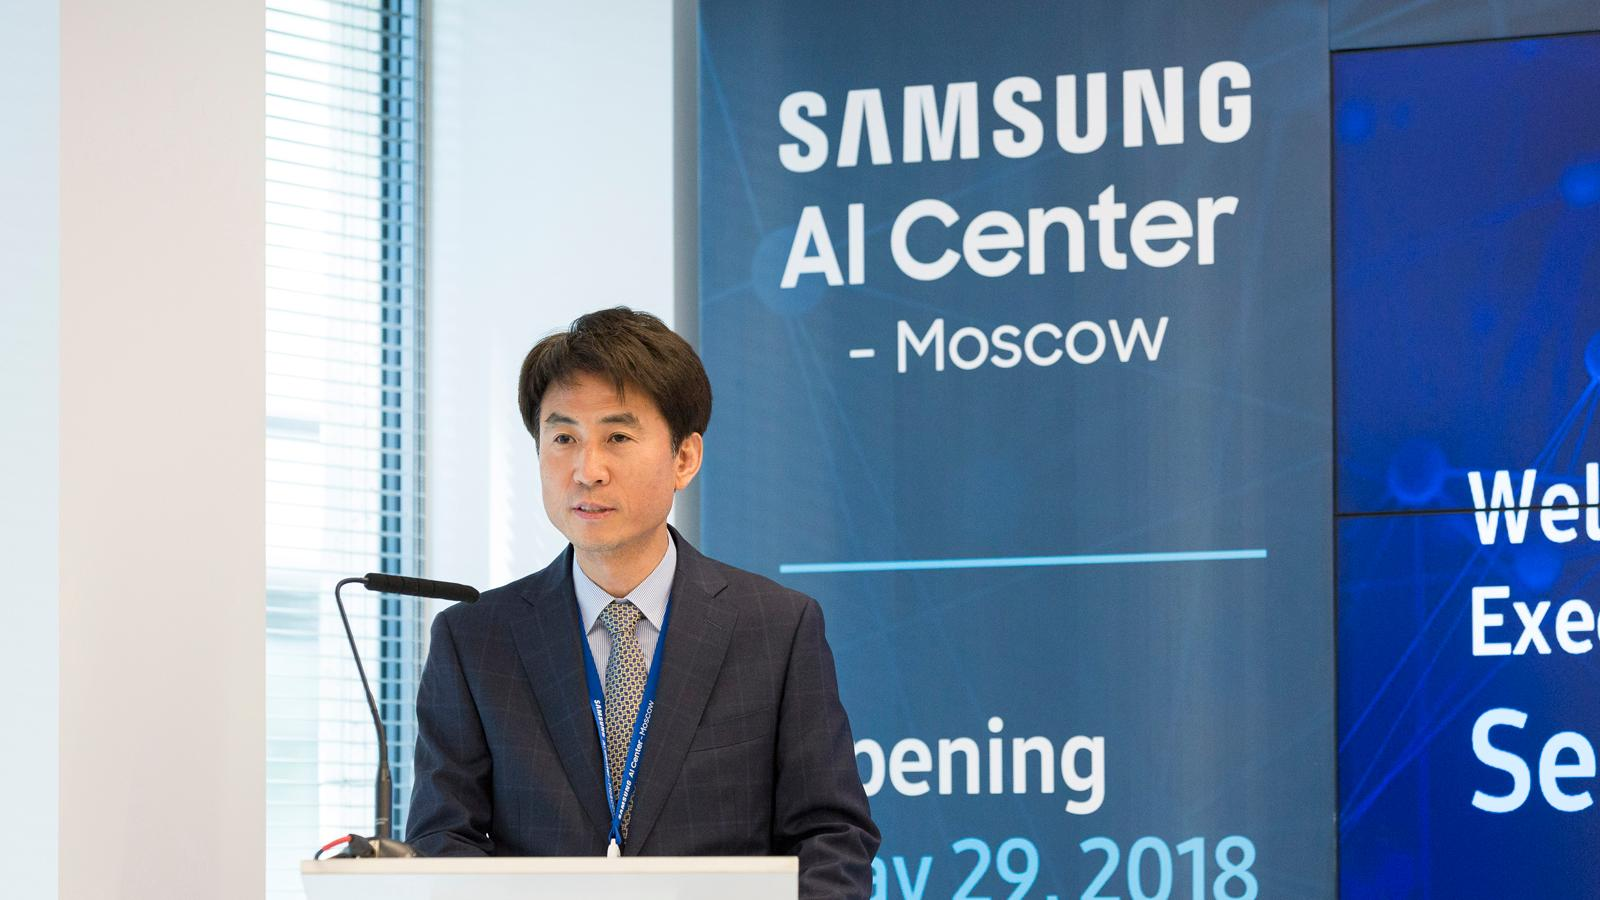 AI Center - Moscow 3